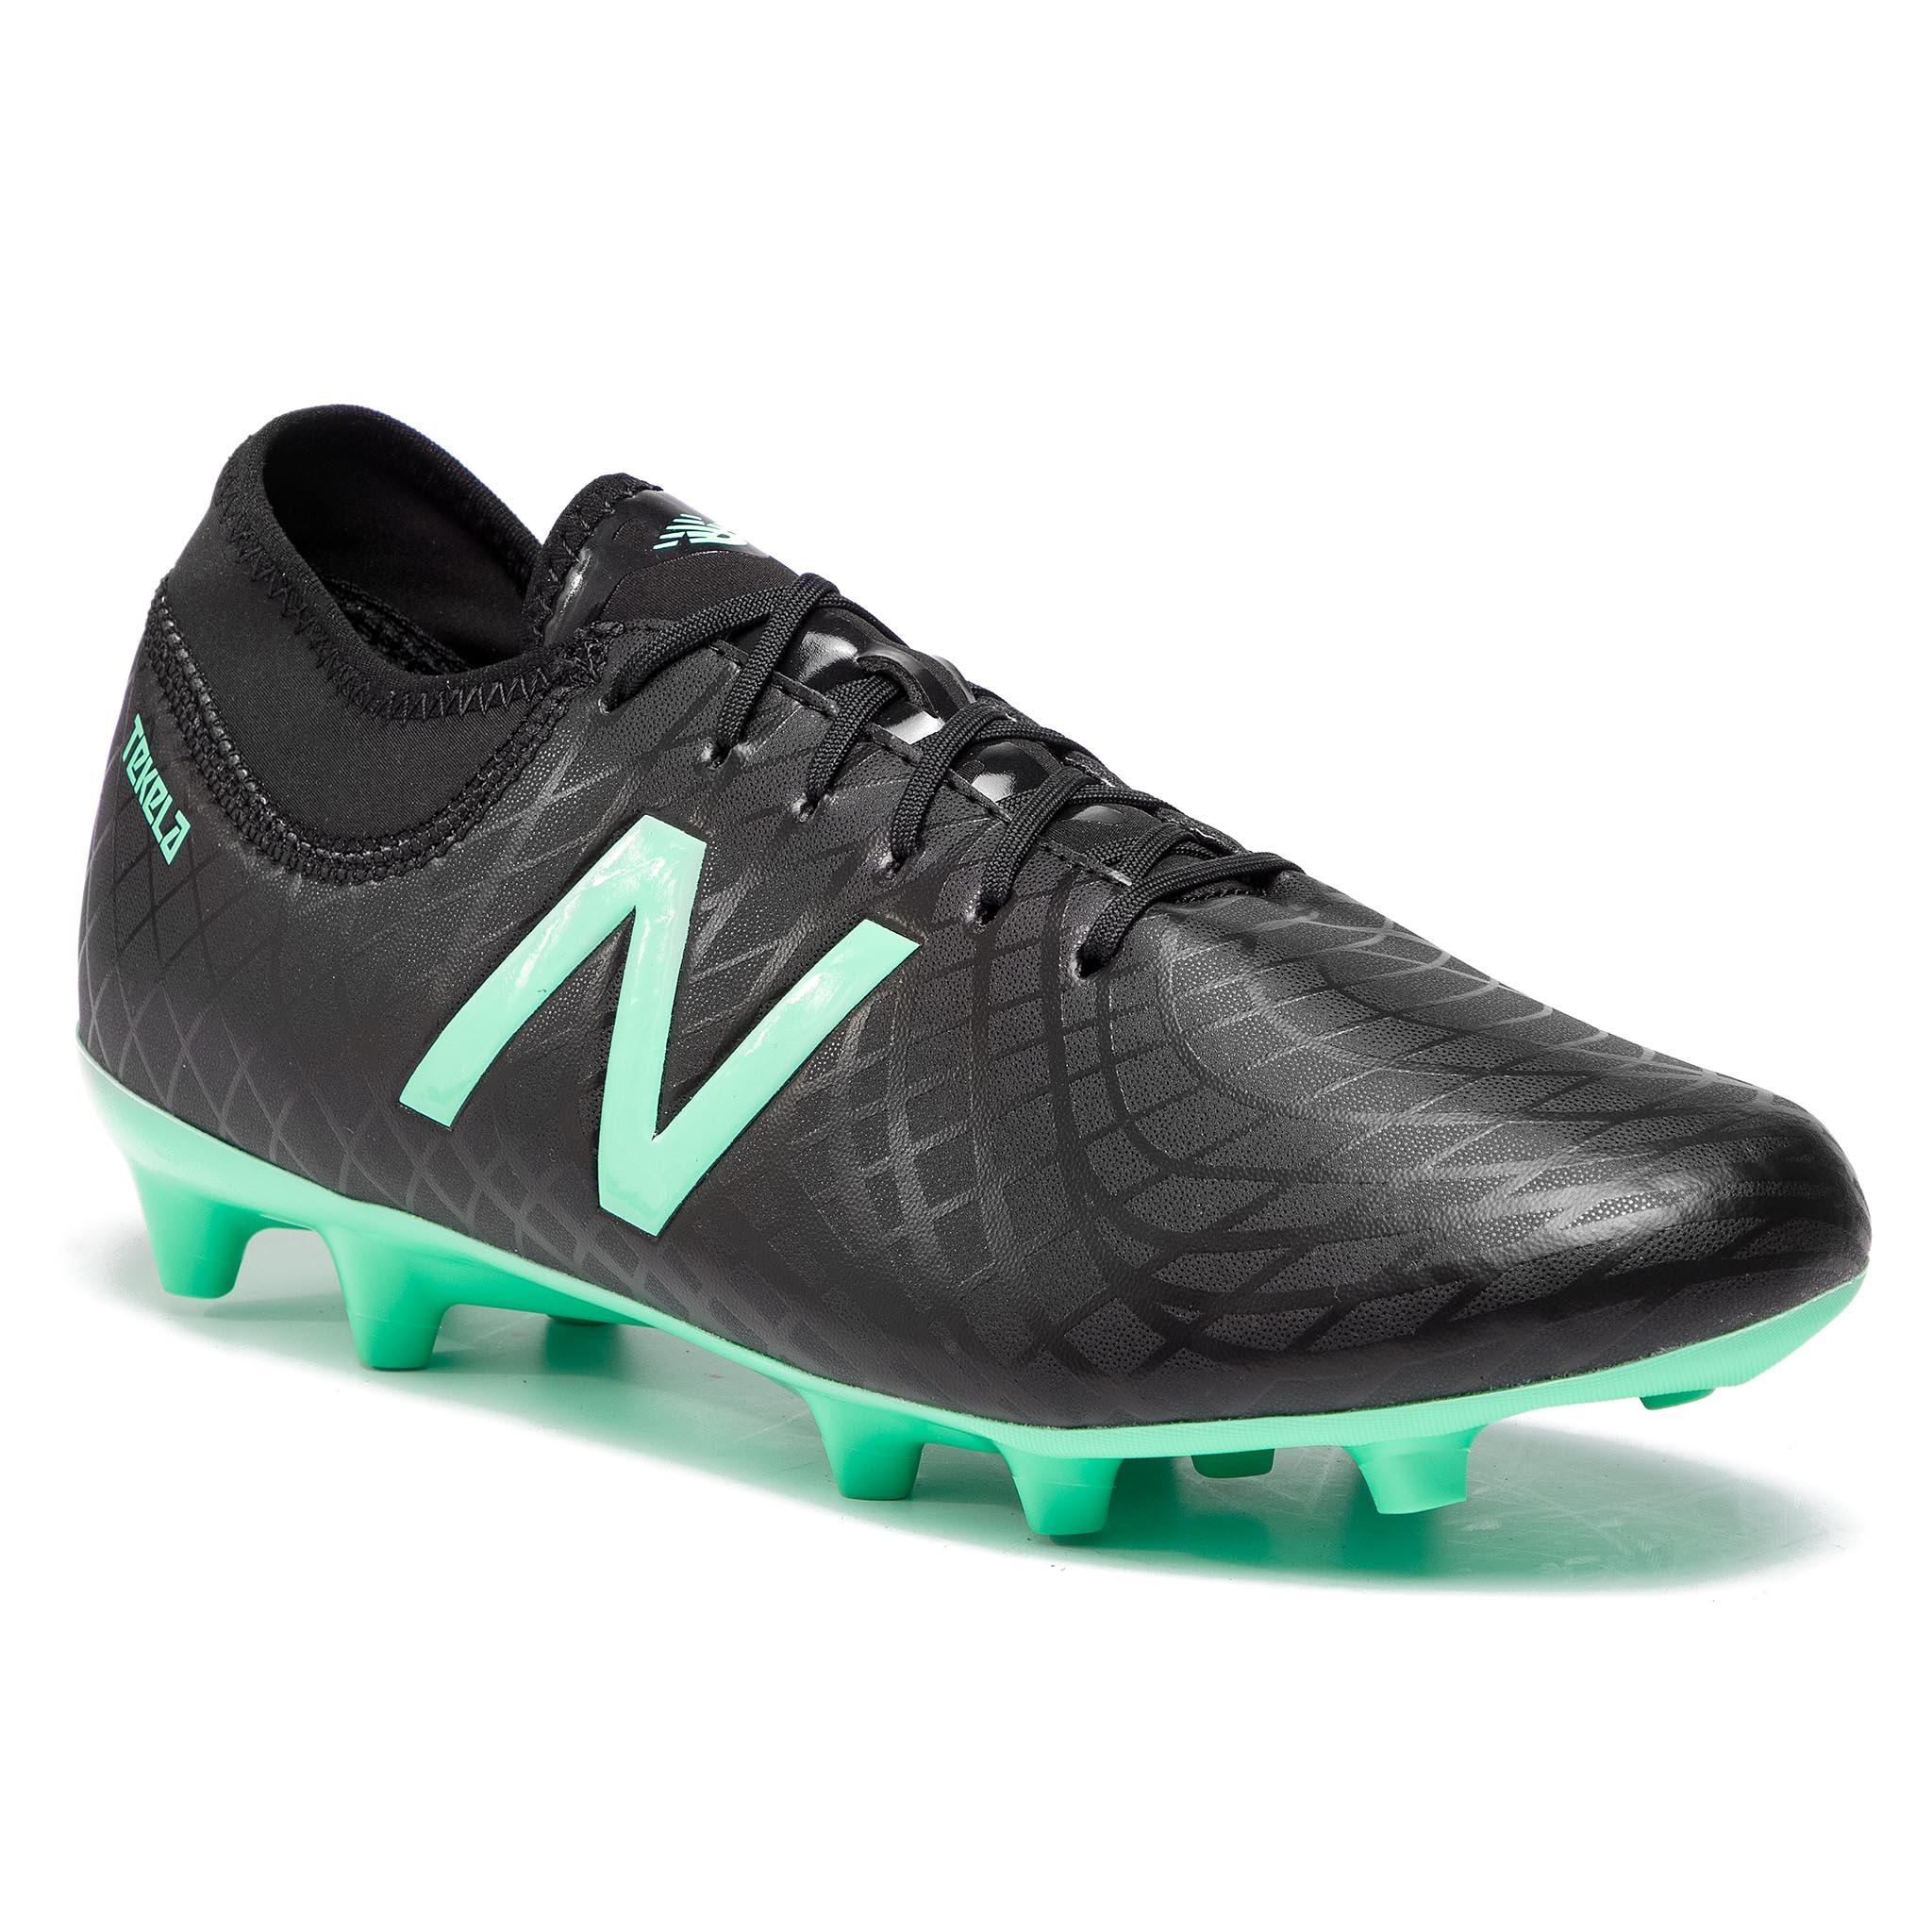 c11a555dfda Παπούτσια NEW BALANCE - MSTTFBN1 Μαύρο - Glami.gr